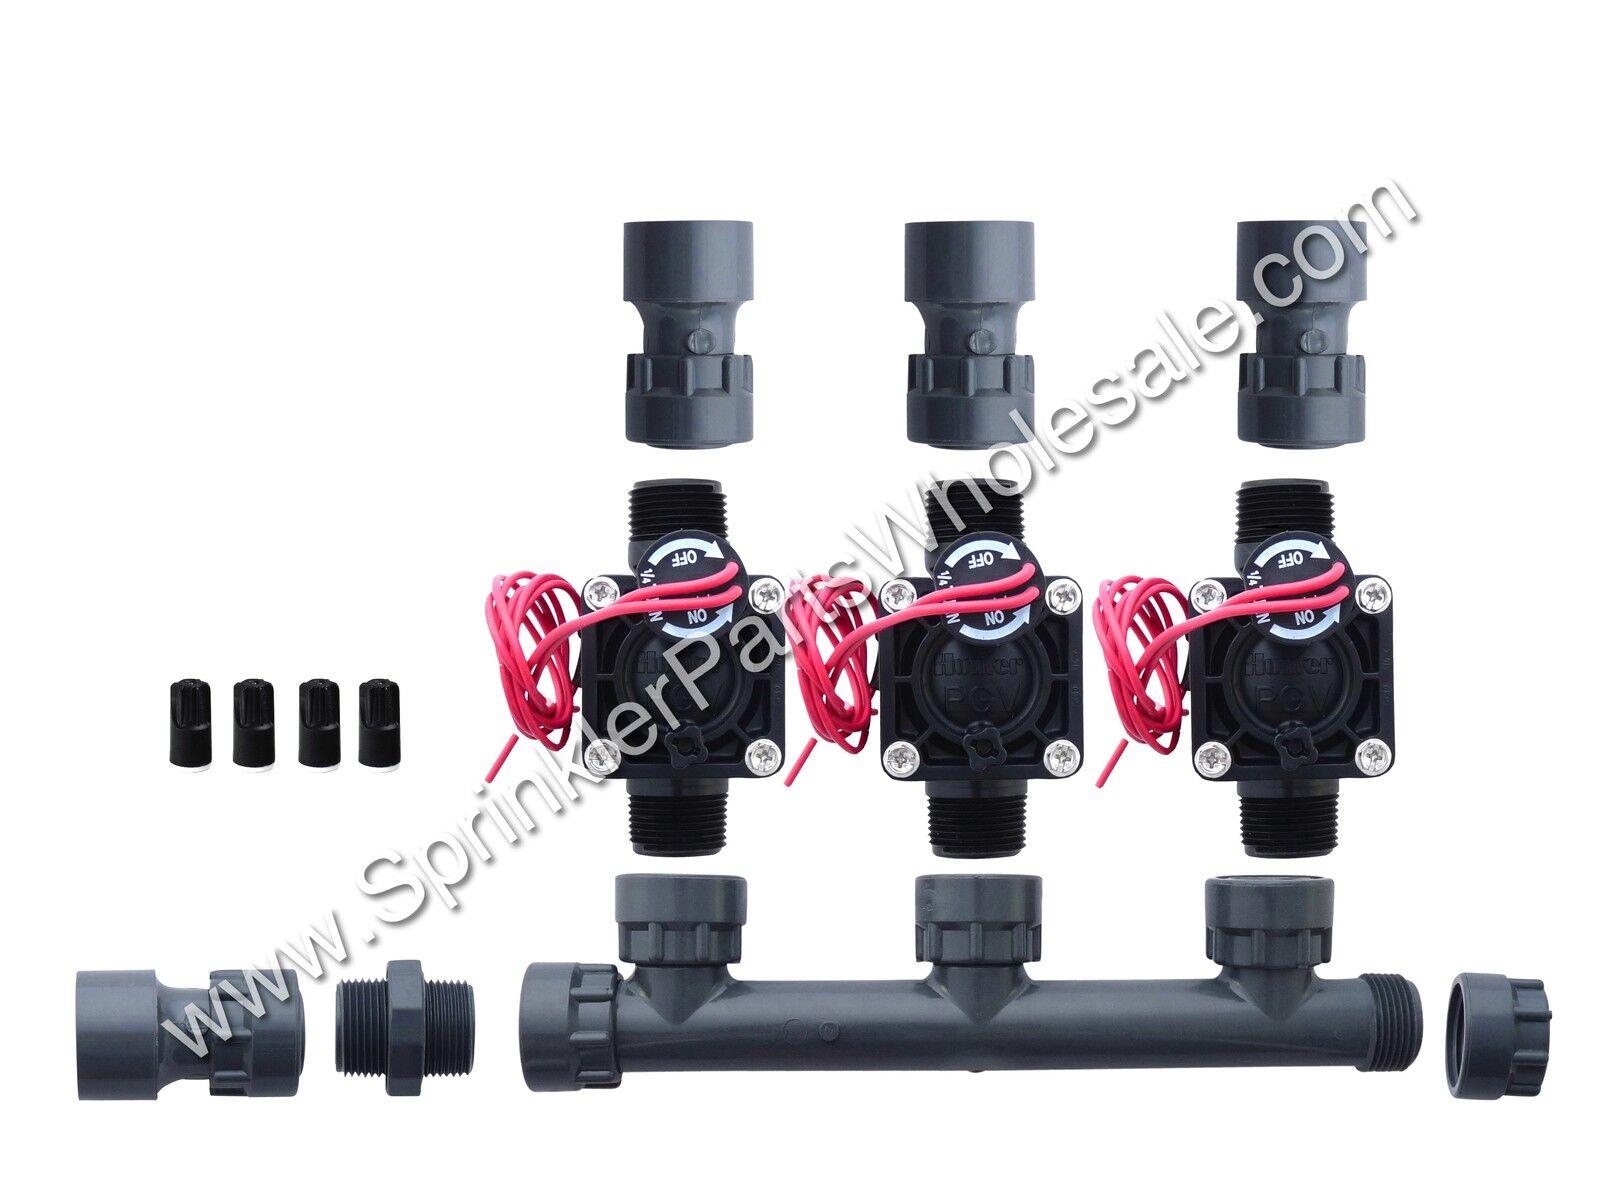 Hunter pgv100-mm 3 Zona Dura colector Válvula Kit N ° Control de flujo-Slip 301-010-3